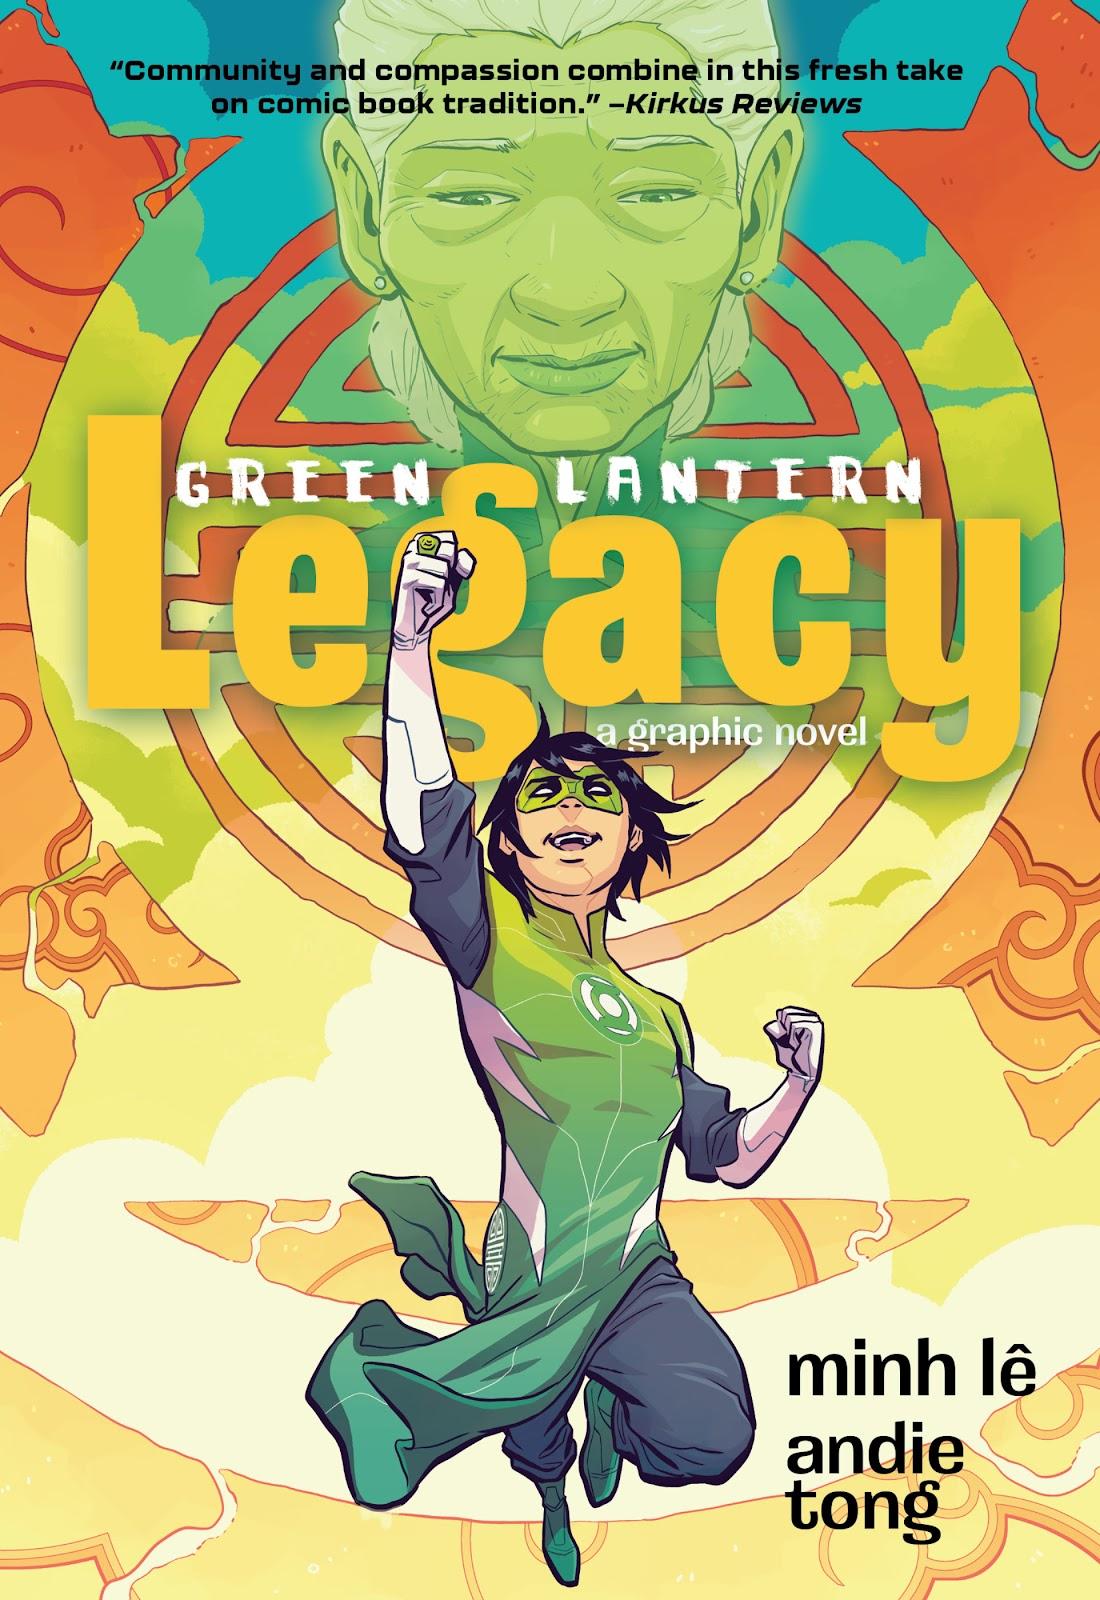 Read online Green Lantern: Legacy comic -  Issue # TPB - 1